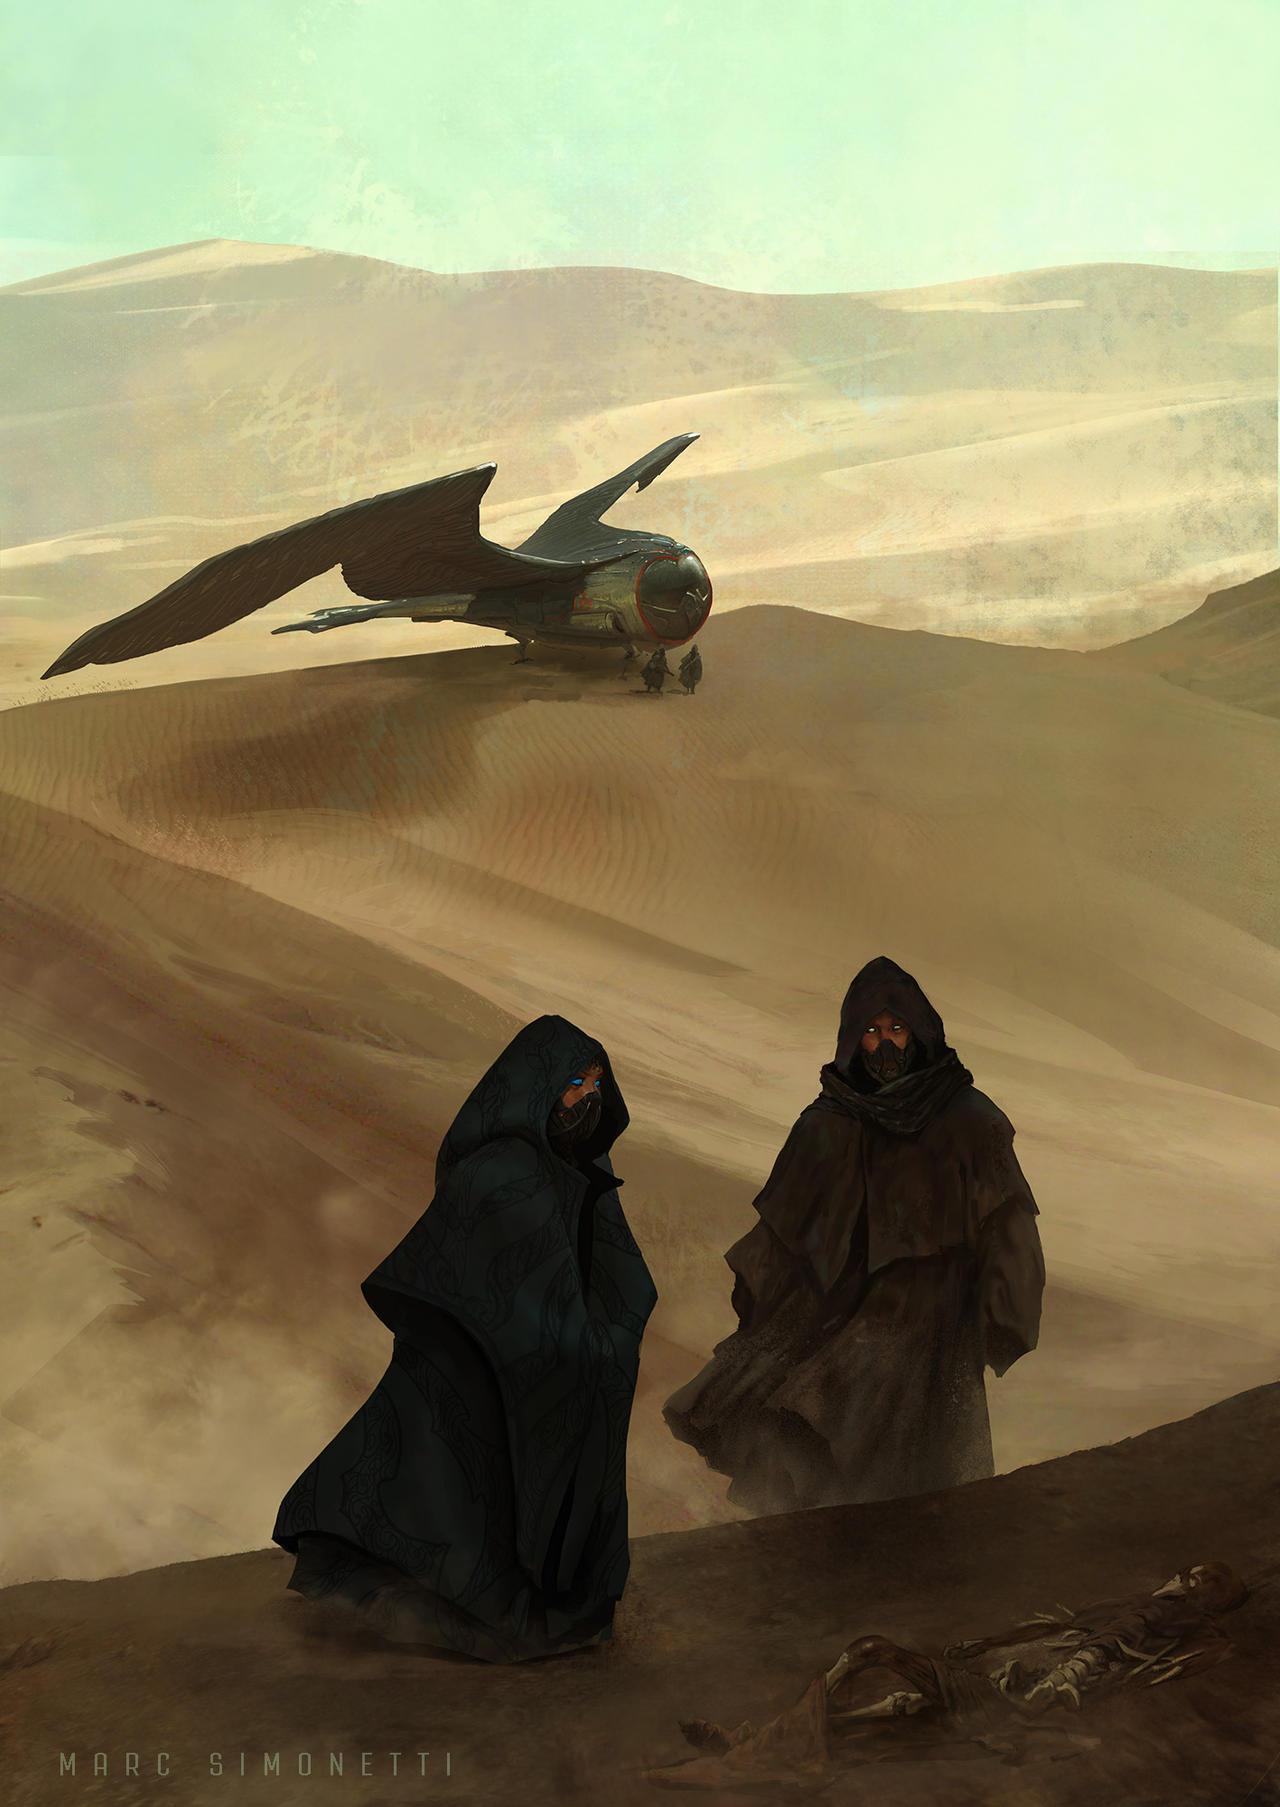 Corpse in the desert. by MarcSimonetti